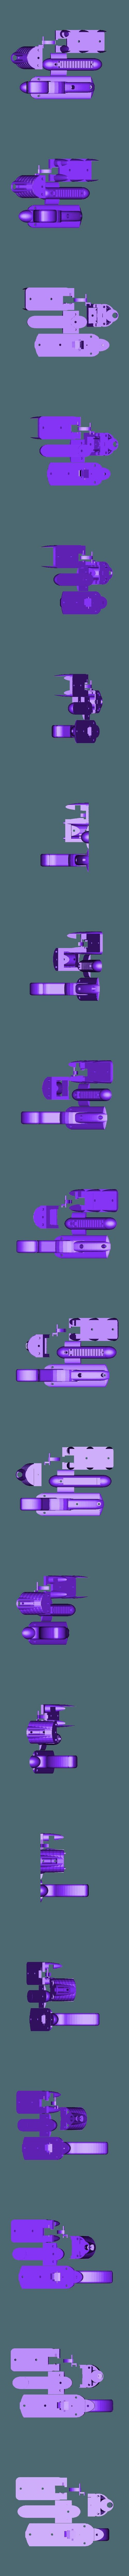 Laser_Gun_Clean.stl Download STL file Laser Gun • 3D printable template, B1nkfish